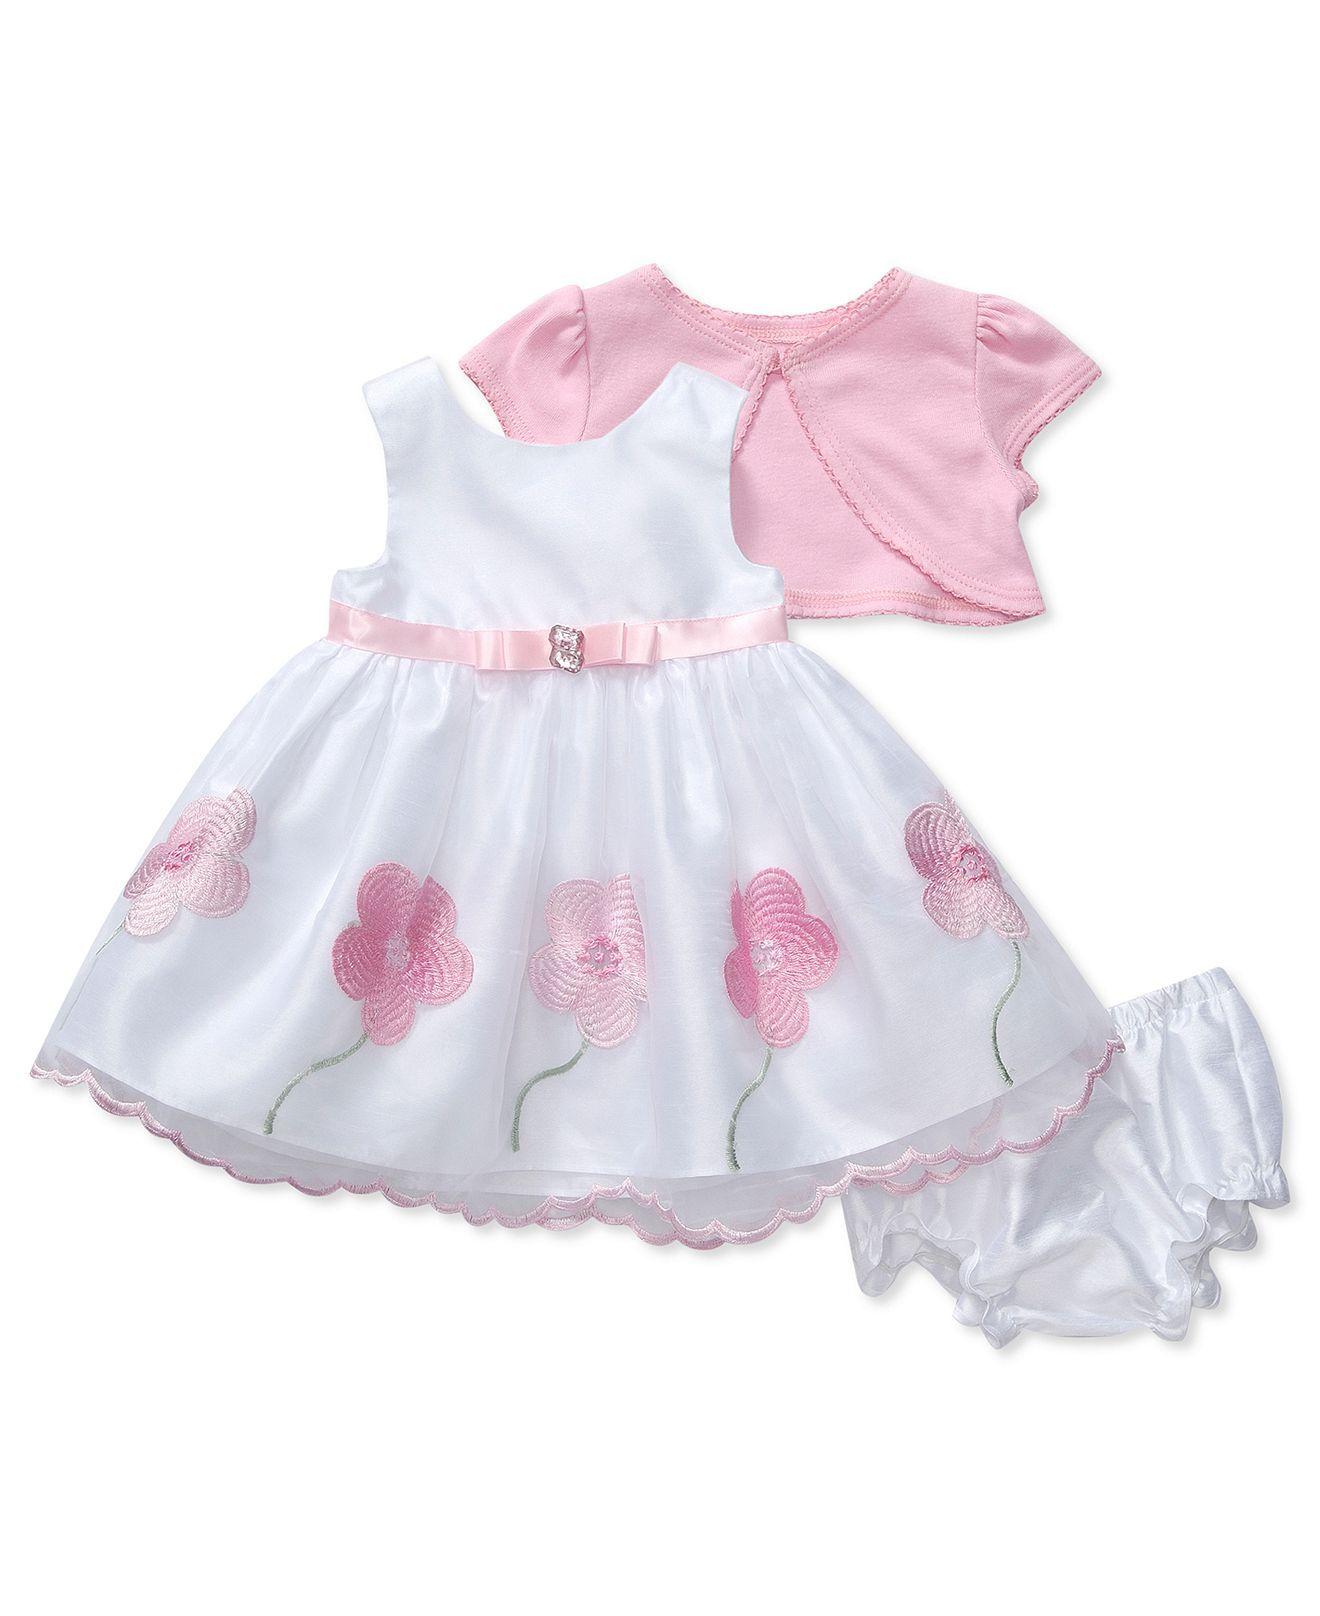 Sweet Heart Rose Baby Dress Baby Girls Flower Applique Dress Kids